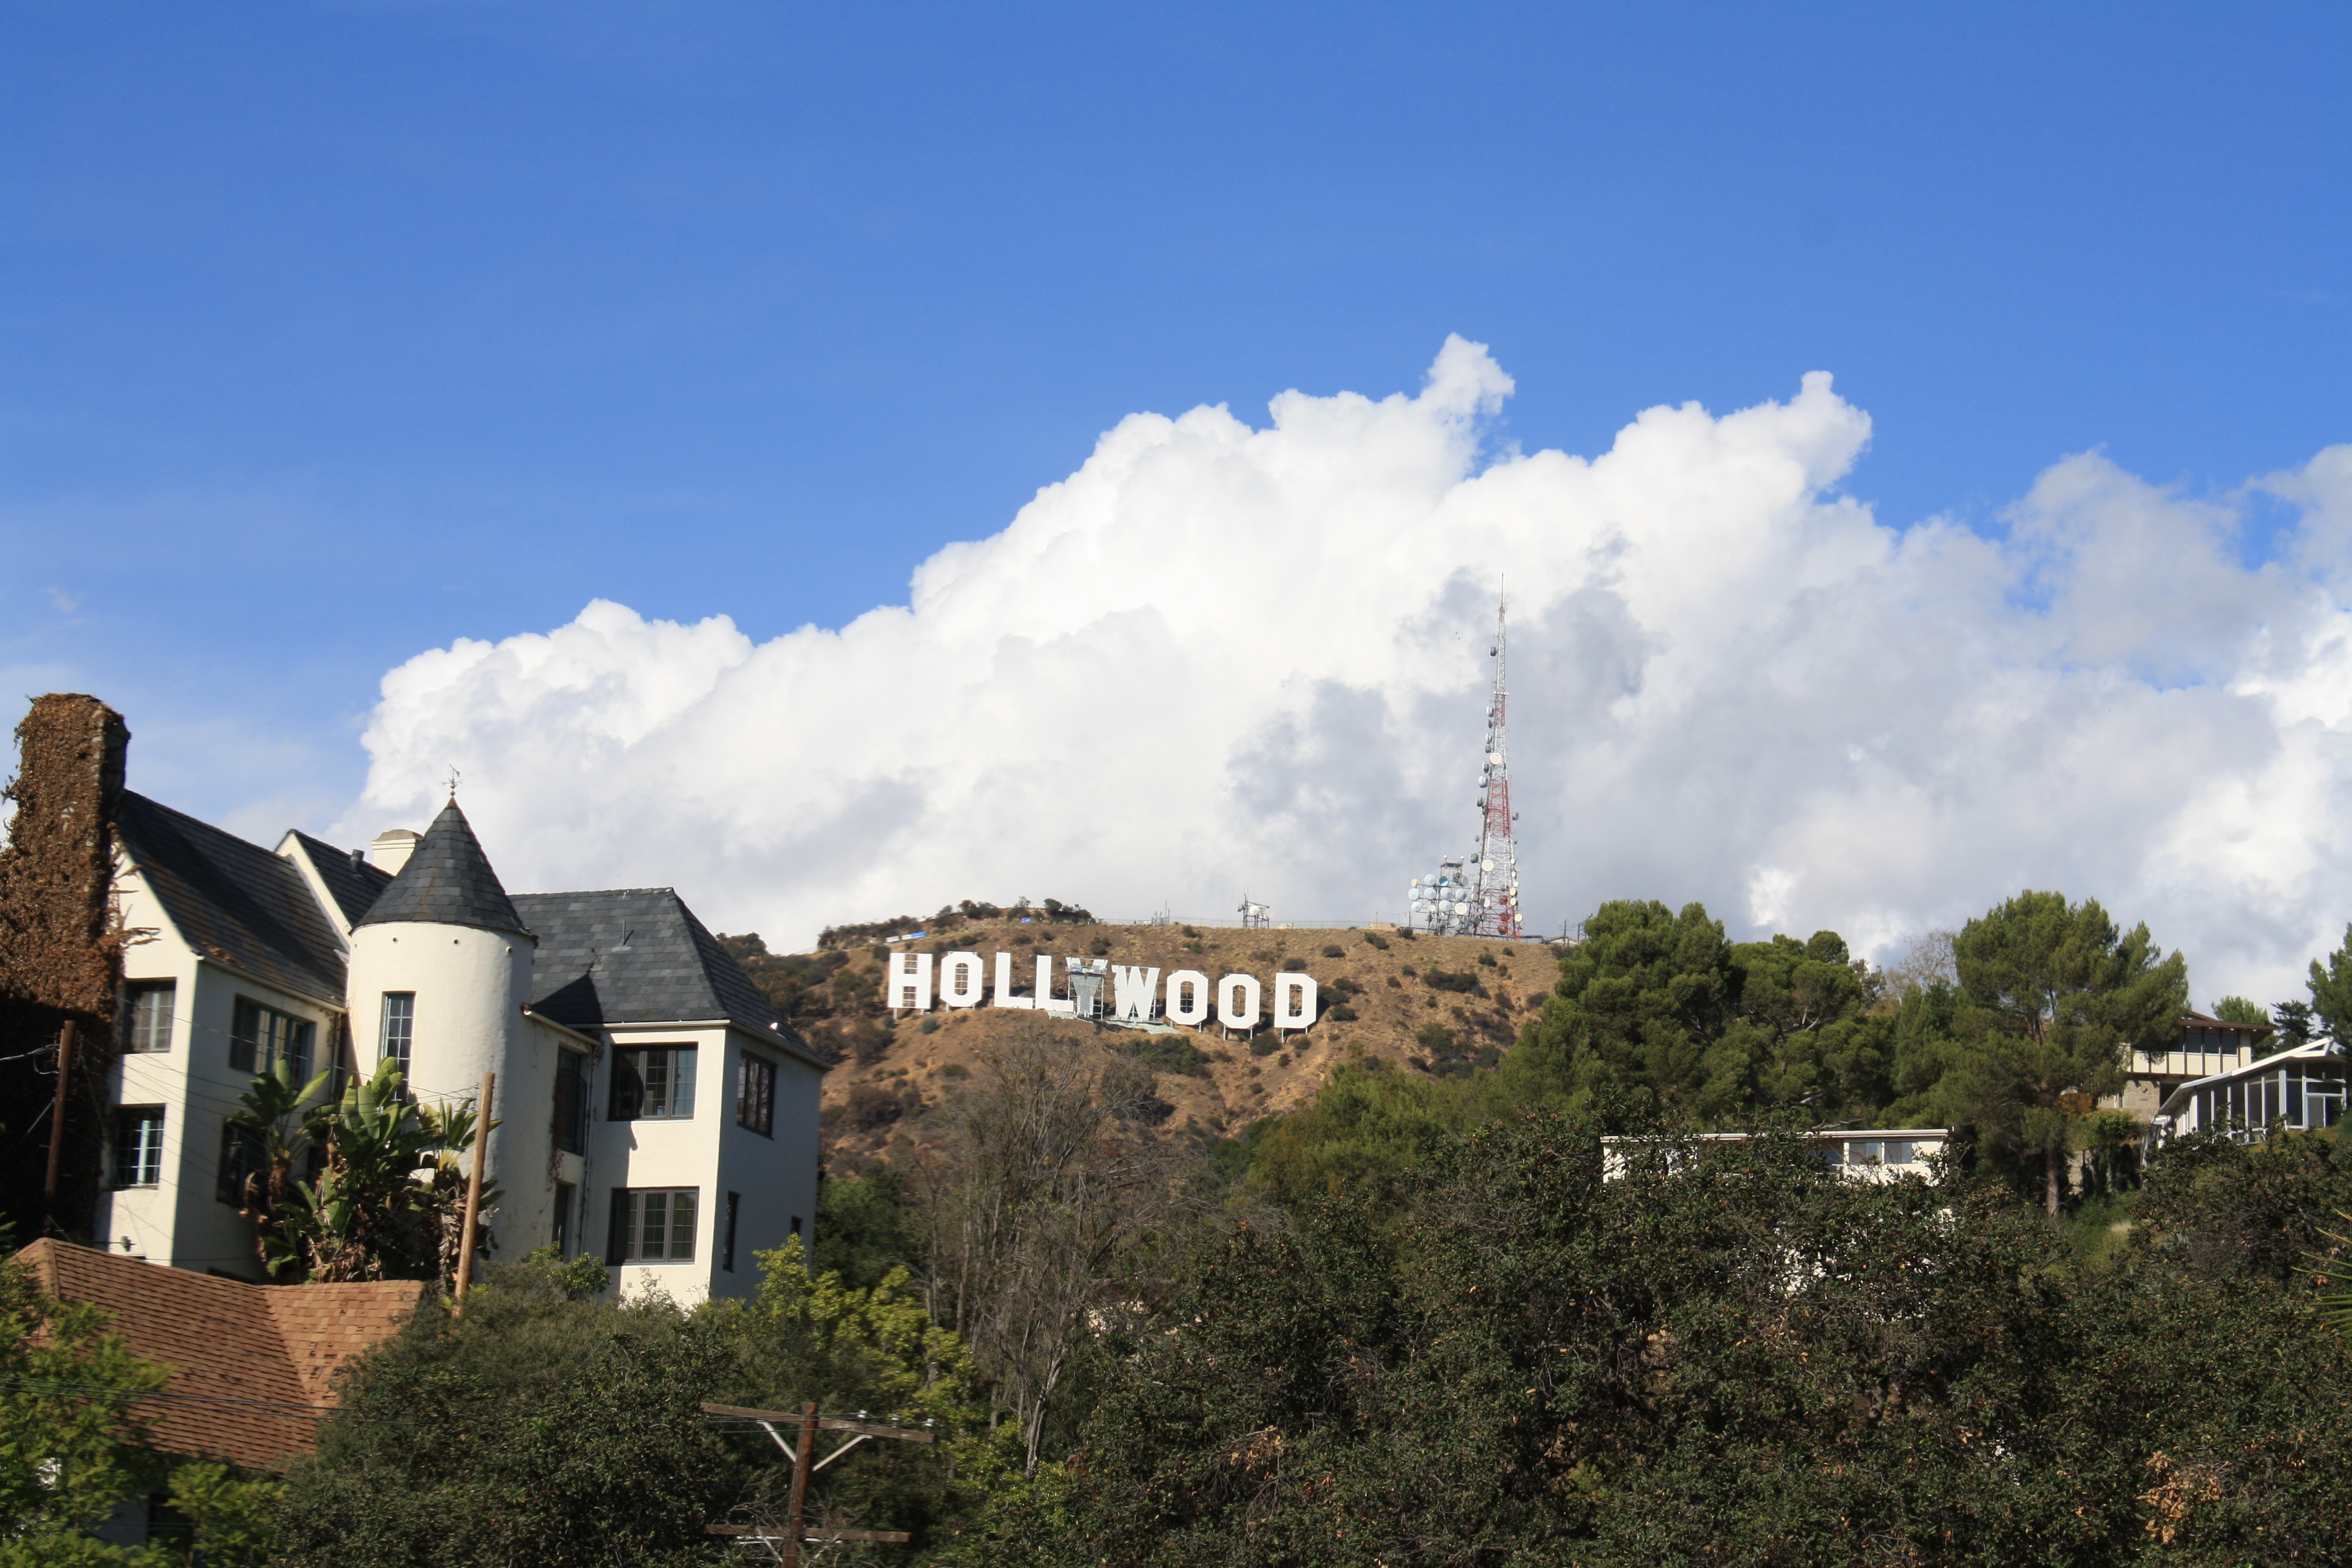 Holly Wood